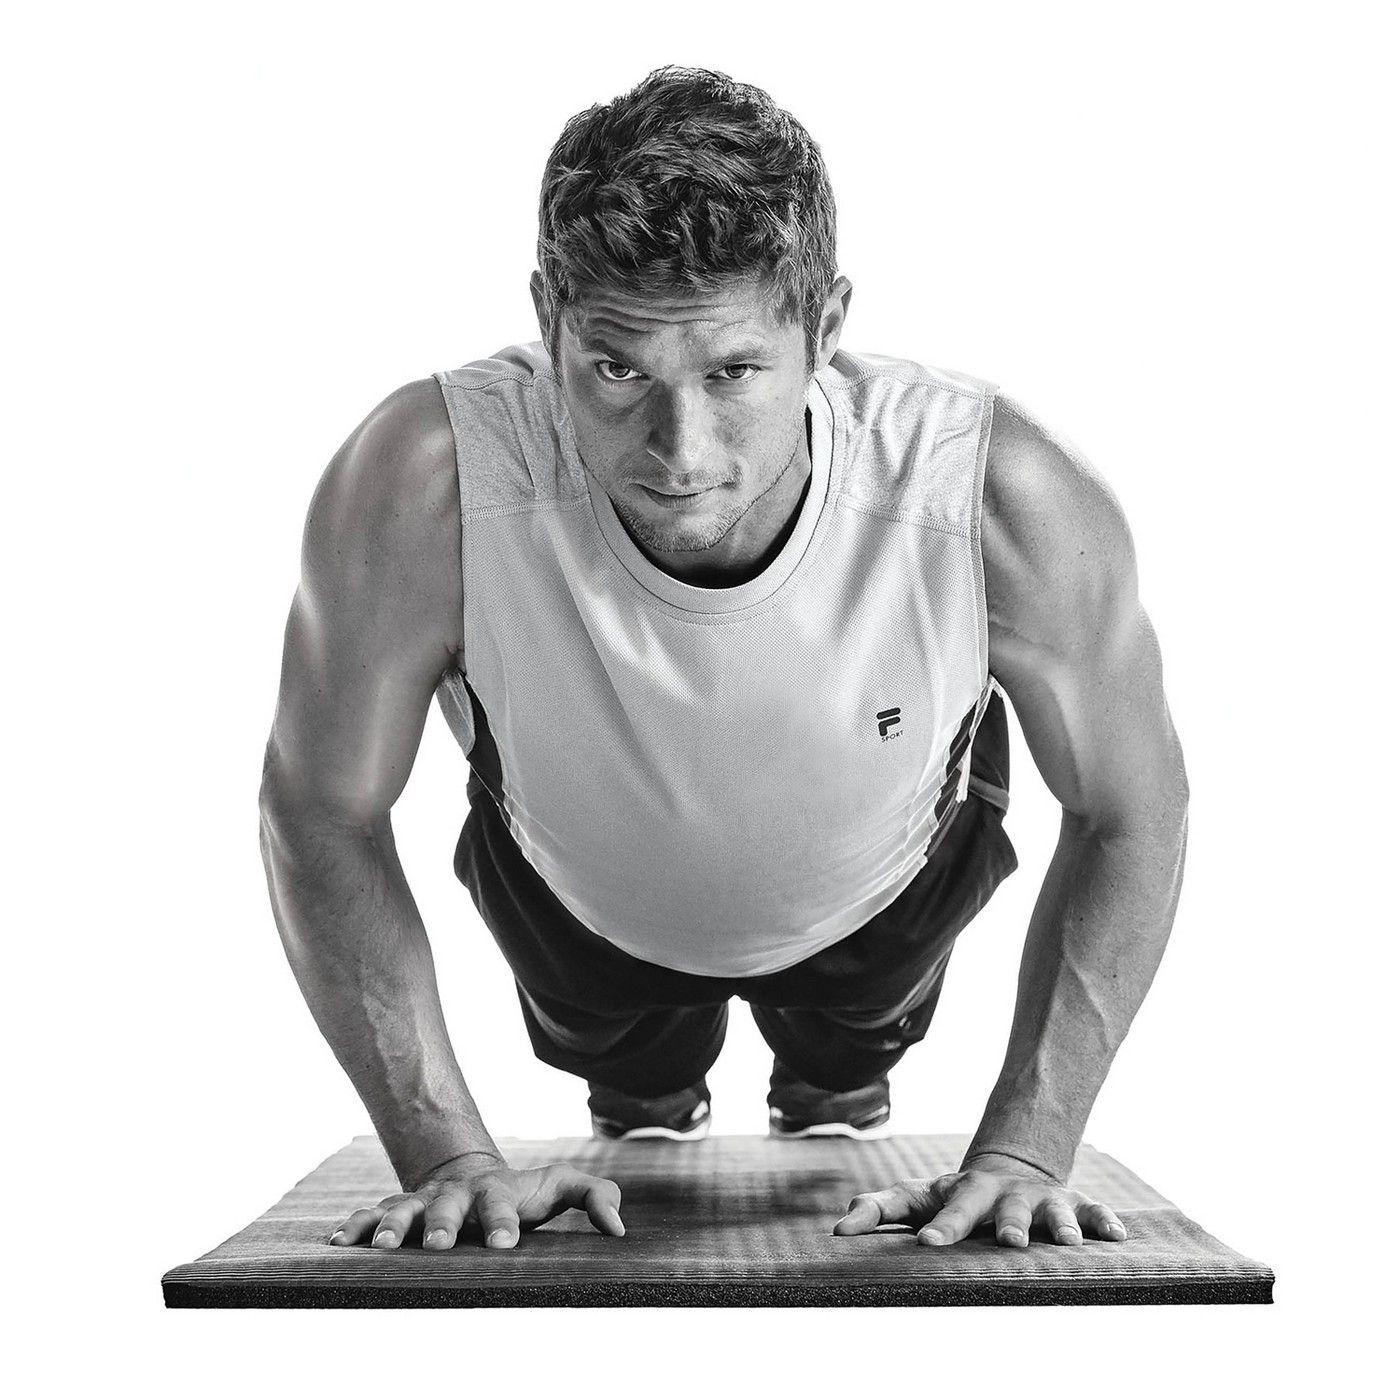 Fila Premium Fitness Mat 15mm In 2020 Mat Exercises Intense Workout Fitness